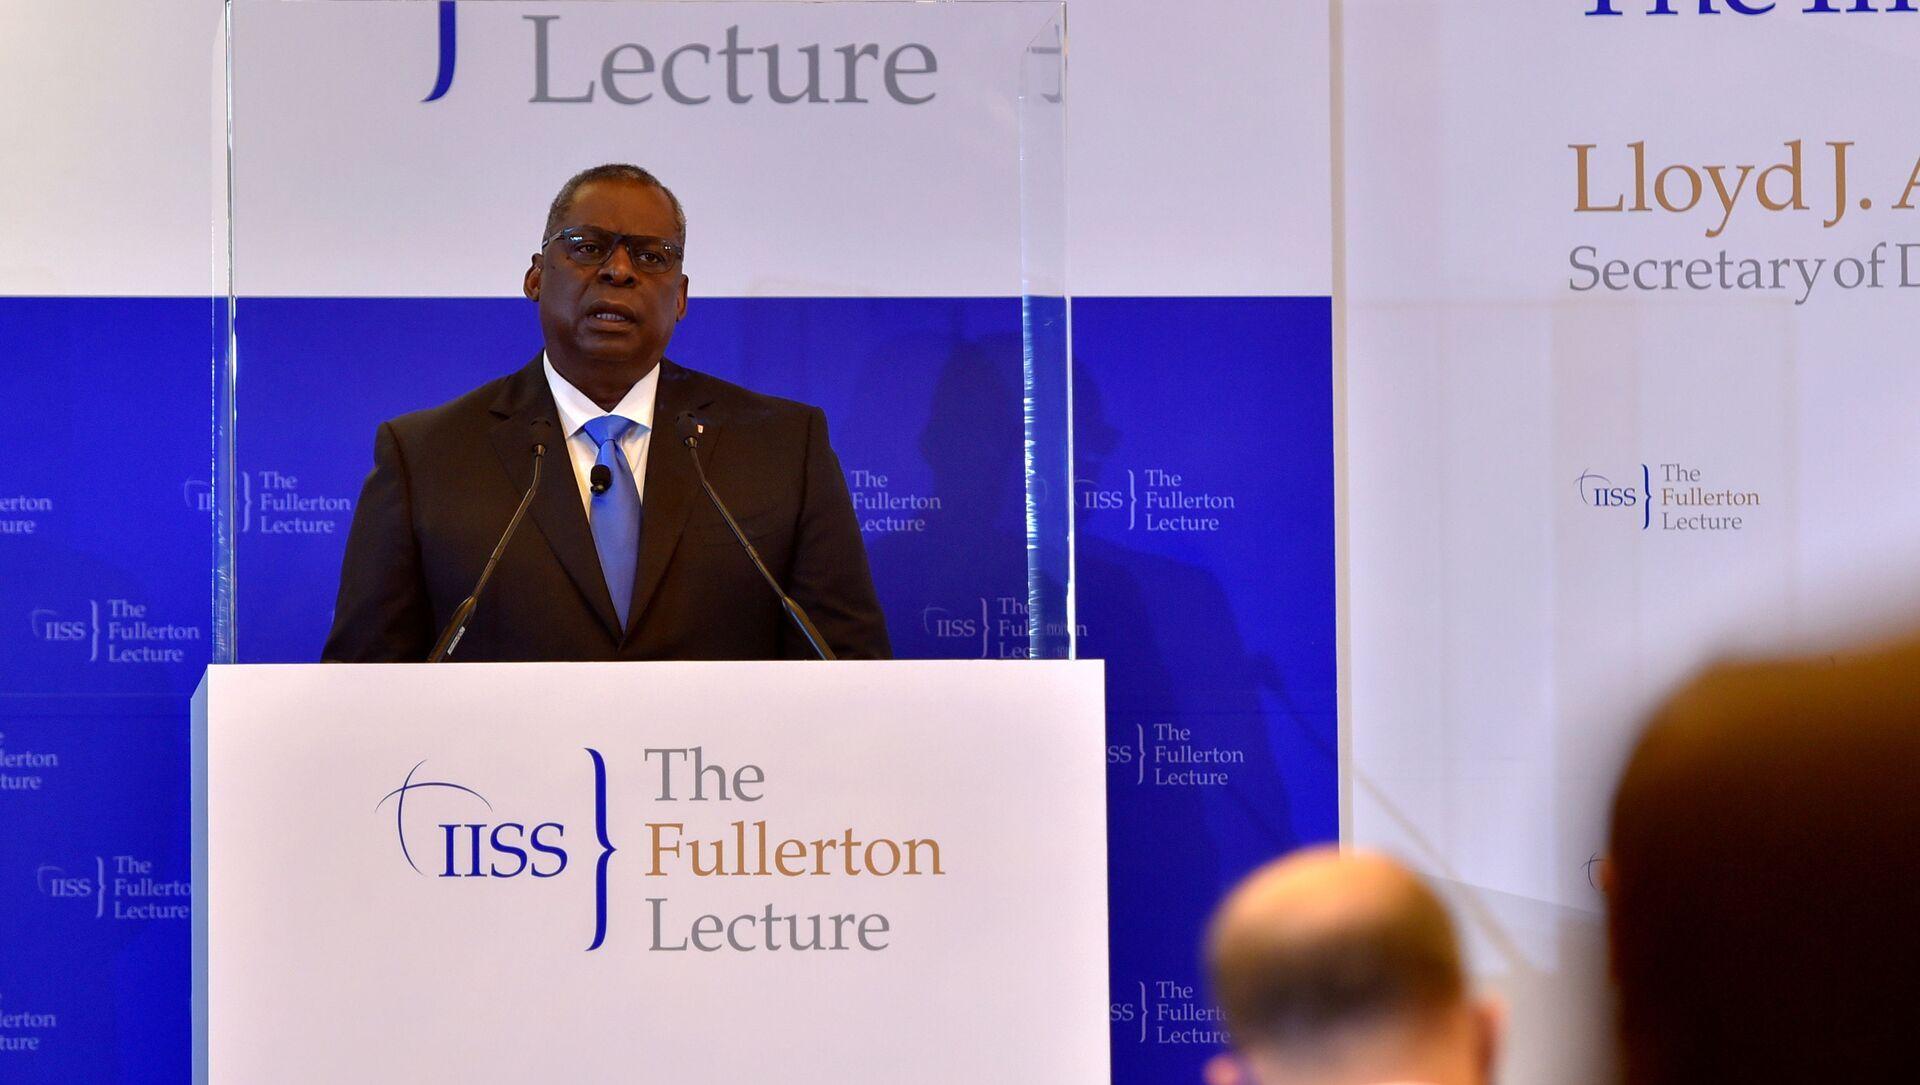 U.S. Defense Secretary Lloyd Austin speaks at the IISS Fullerton Lecture in Singapore July 27, 2021. - Sputnik International, 1920, 27.07.2021